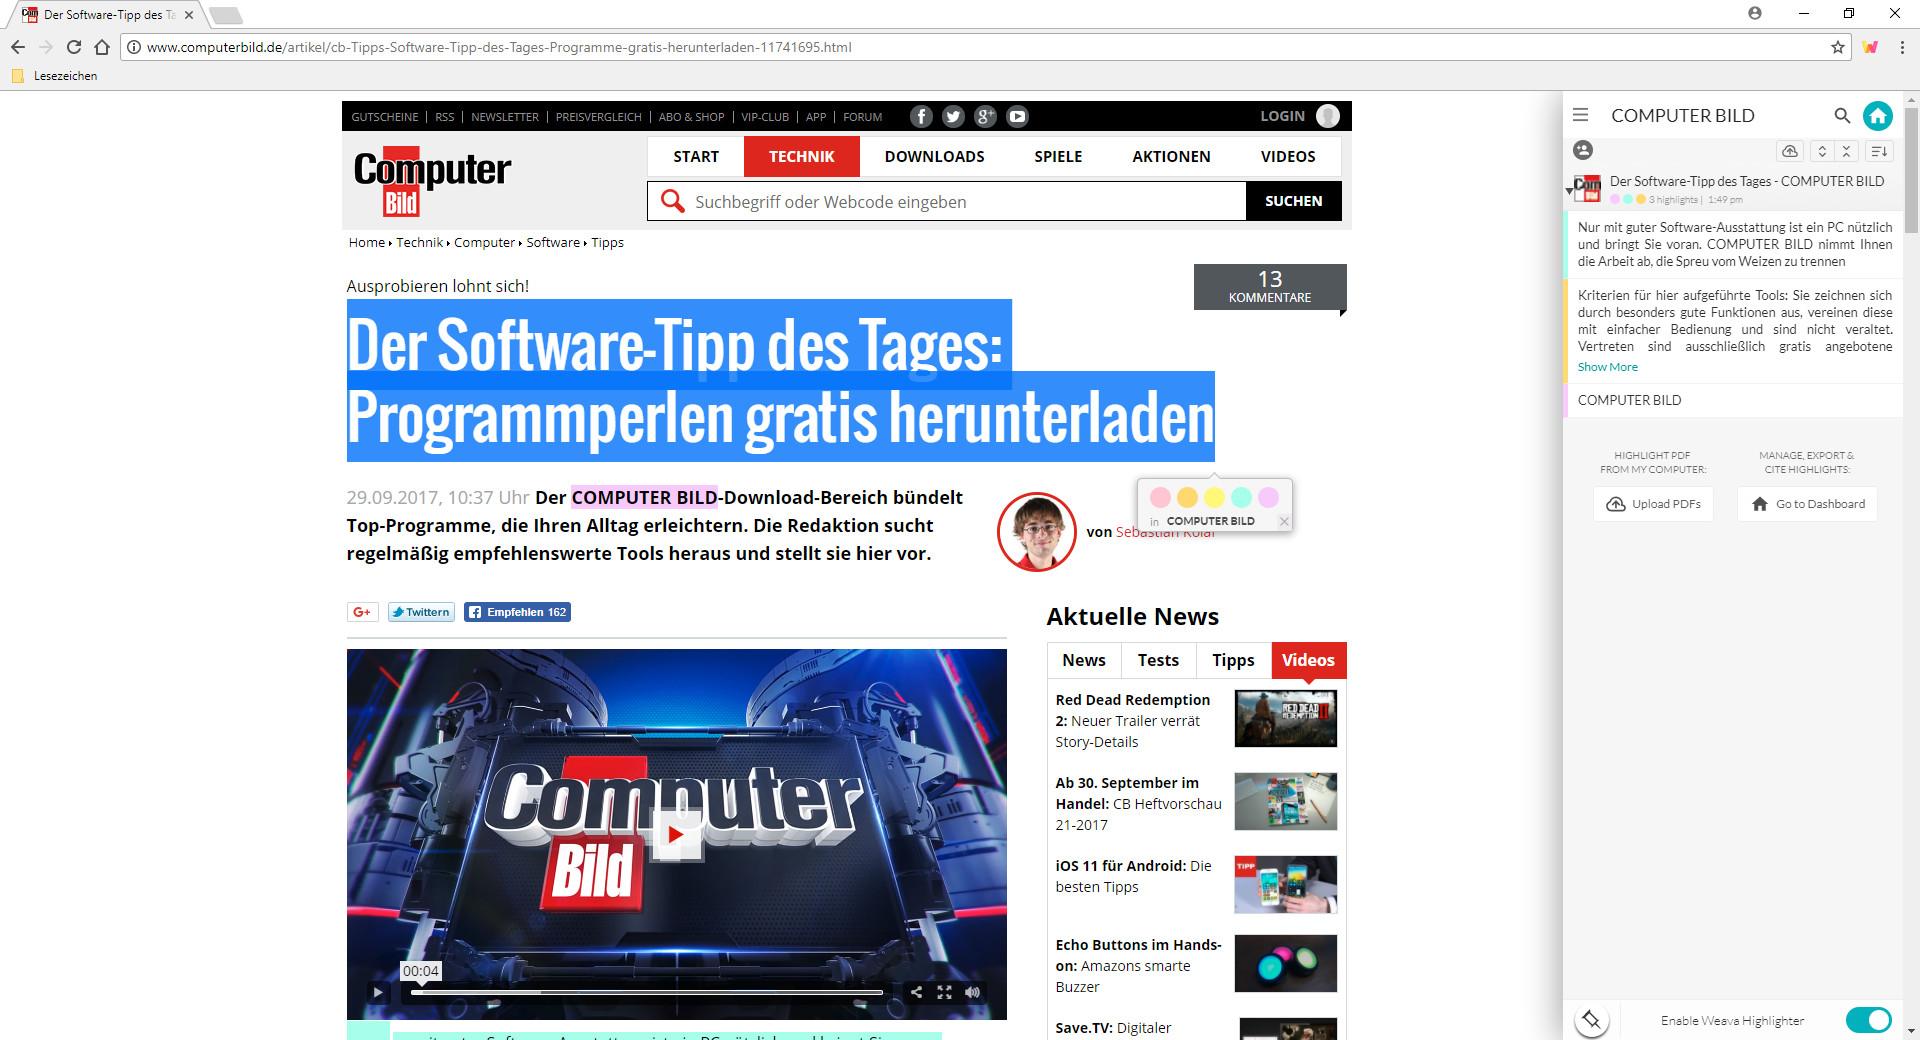 Screenshot 1 - Weava Highlighter (PDF & Web) für Chrome